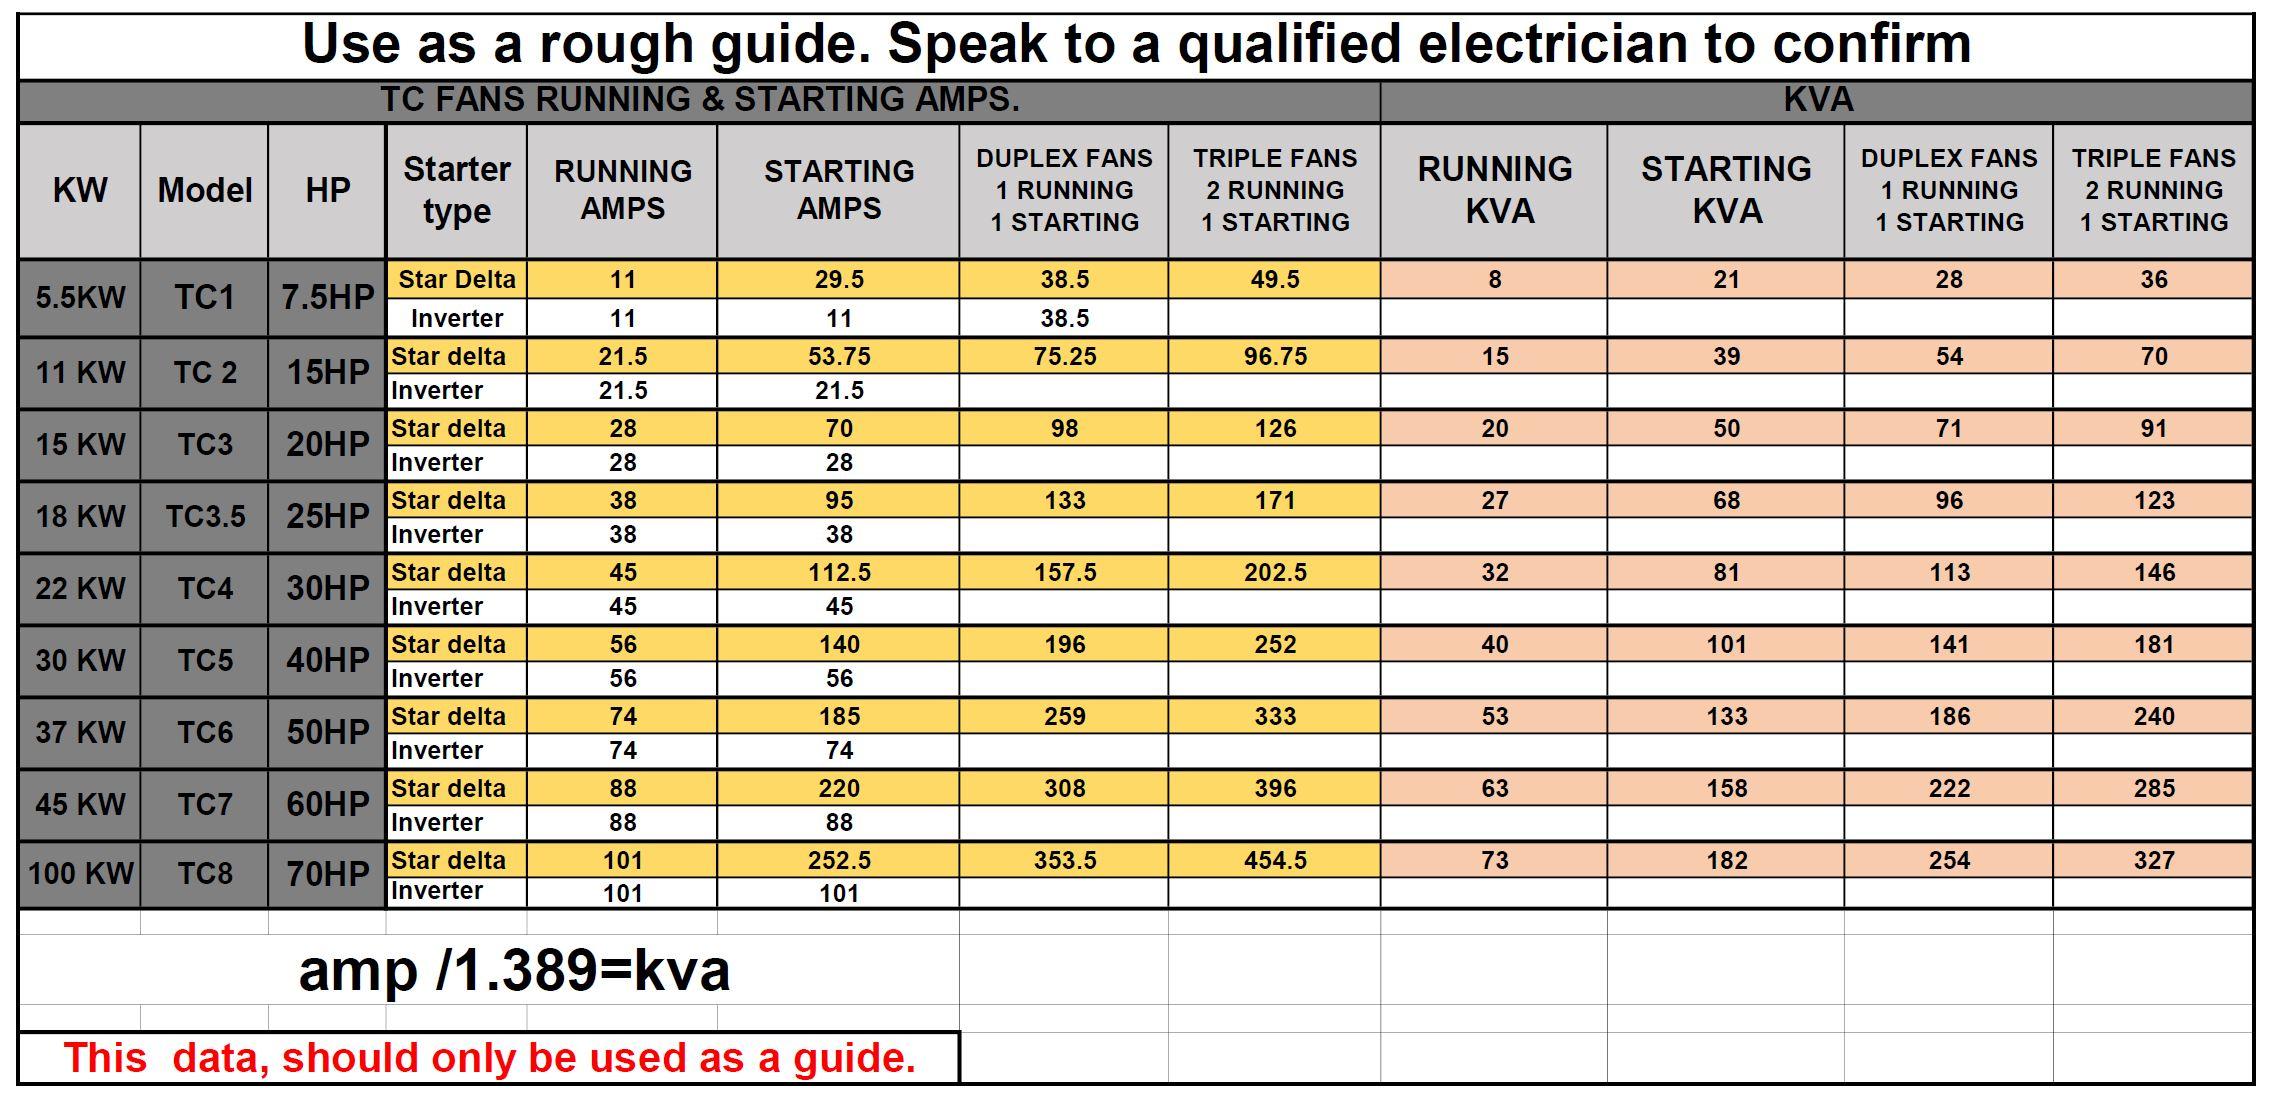 Typhoon Fans - Electrical Info